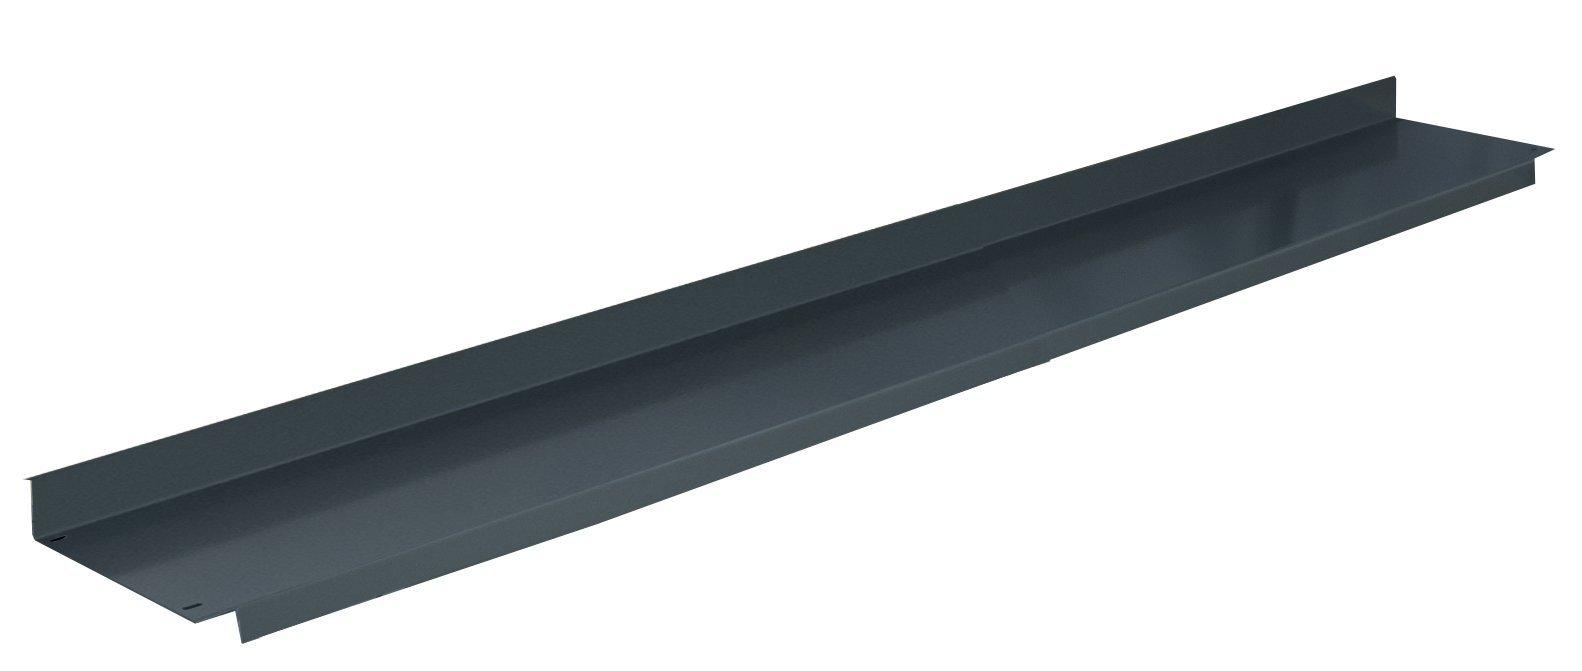 Durham 14 Gauge Steel Optional Shelf for 60'' Workbench, WB-SHELF-60-95